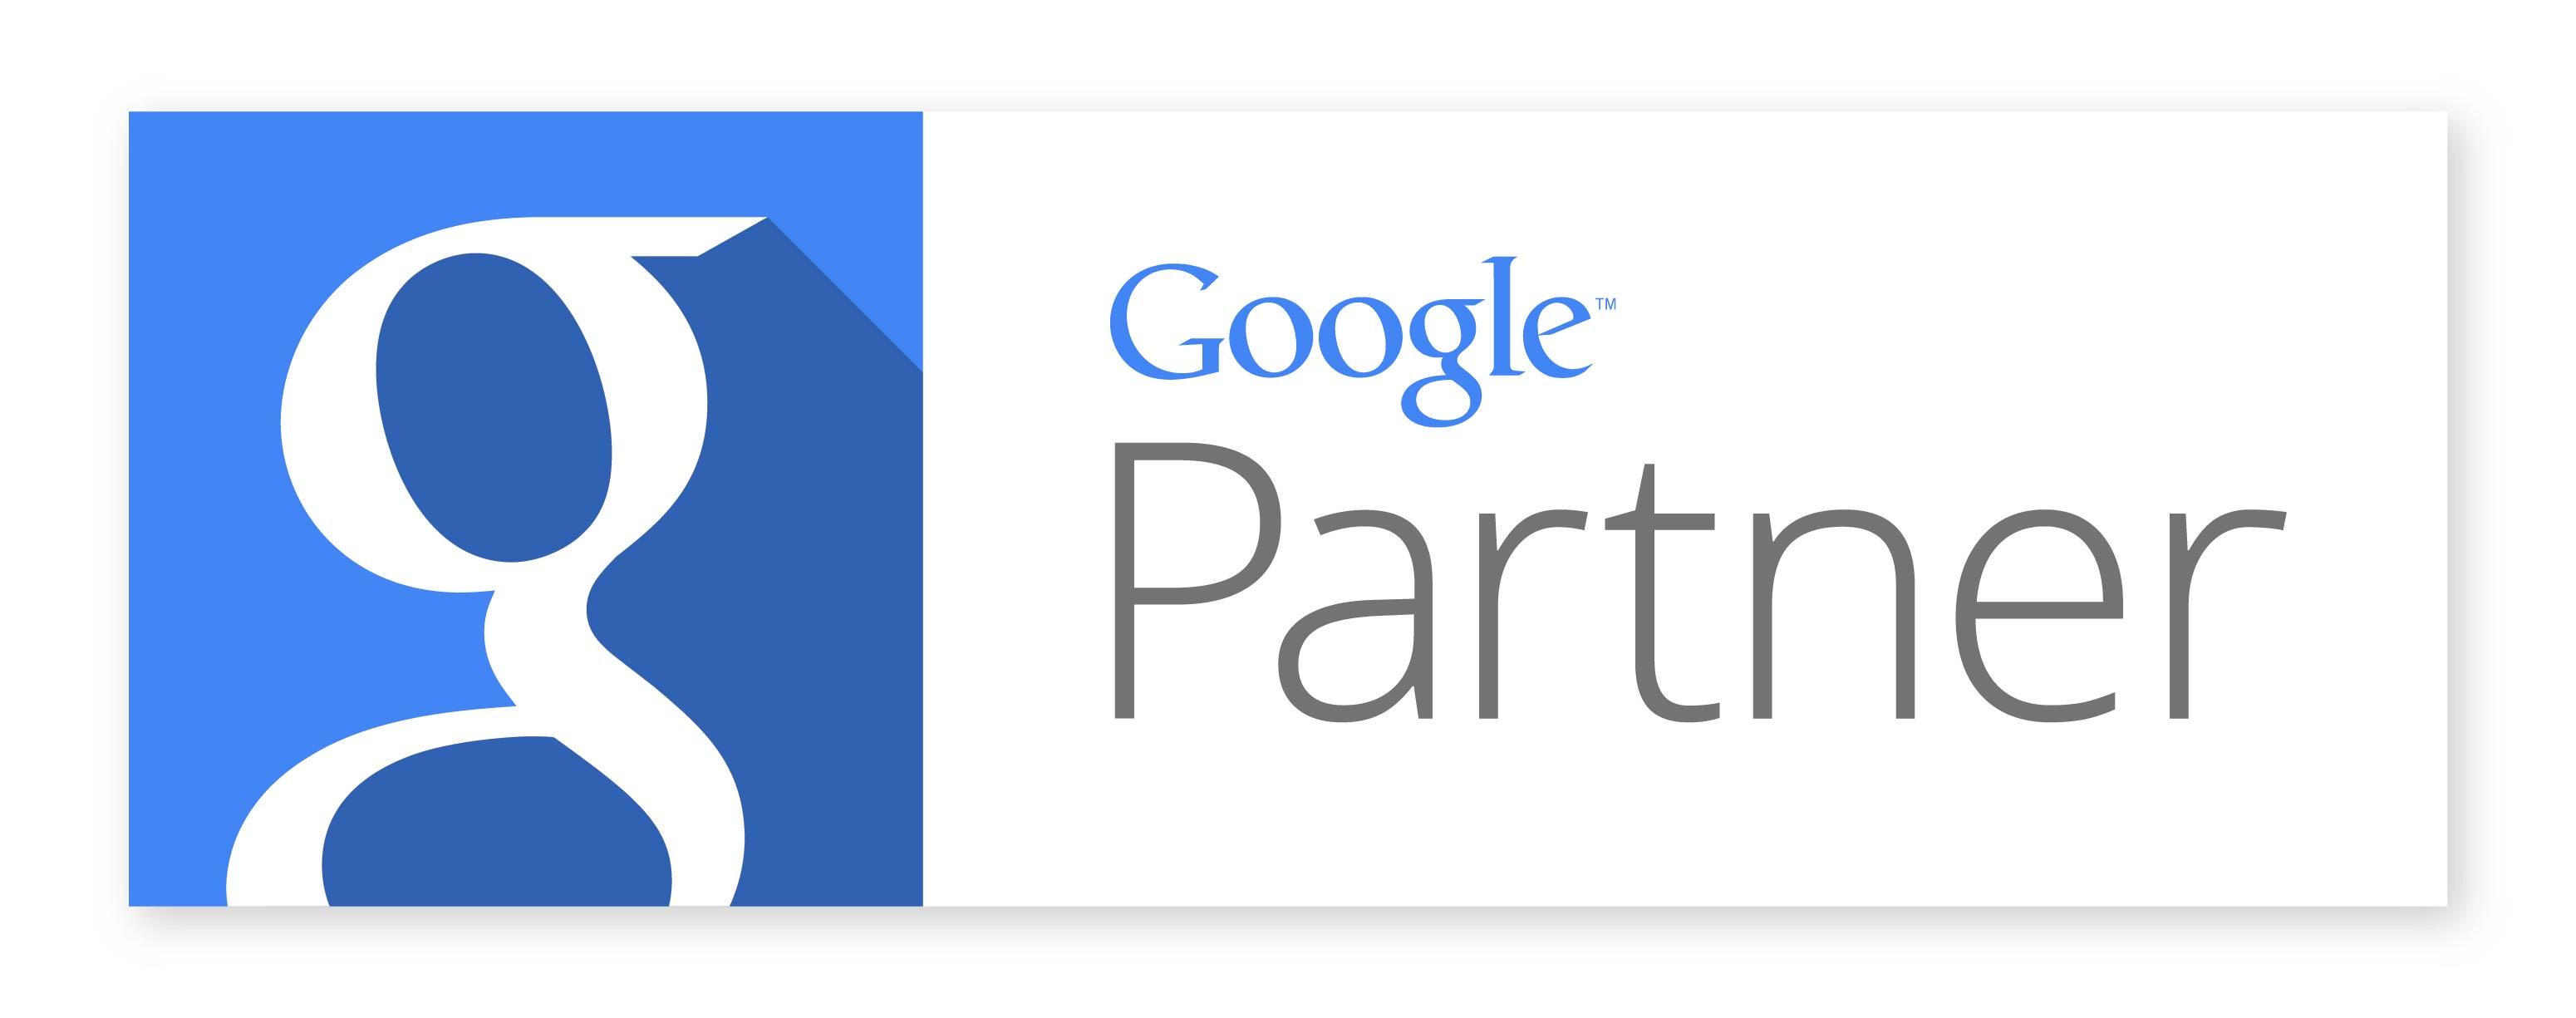 google partner-02